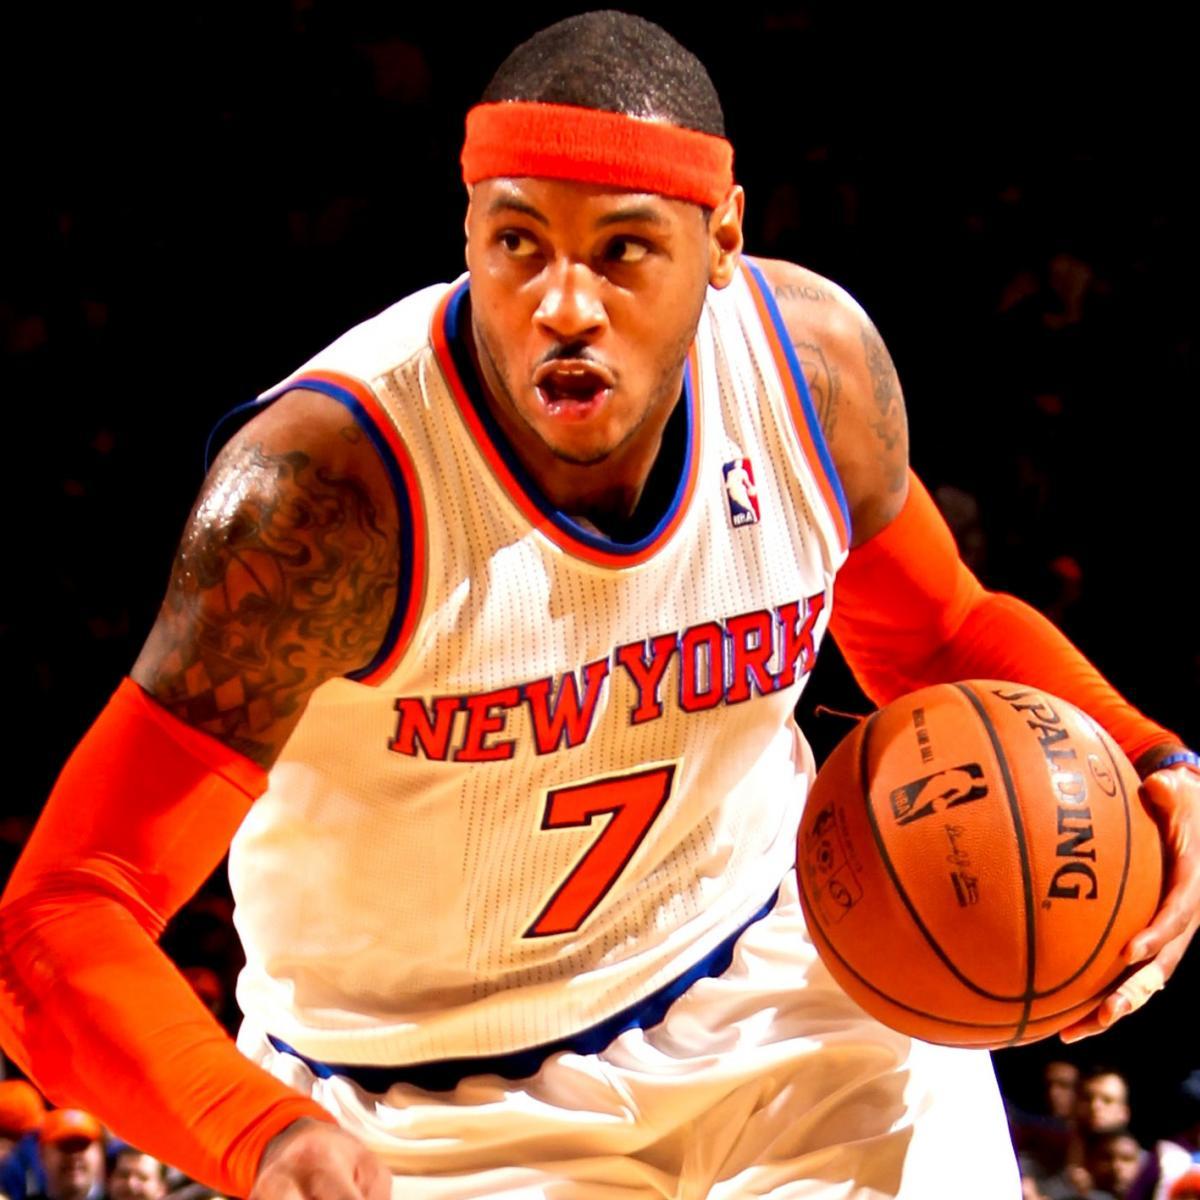 Portland Blazers Live Score: Portland Blazers Vs. New York Knicks: Live Score, Results